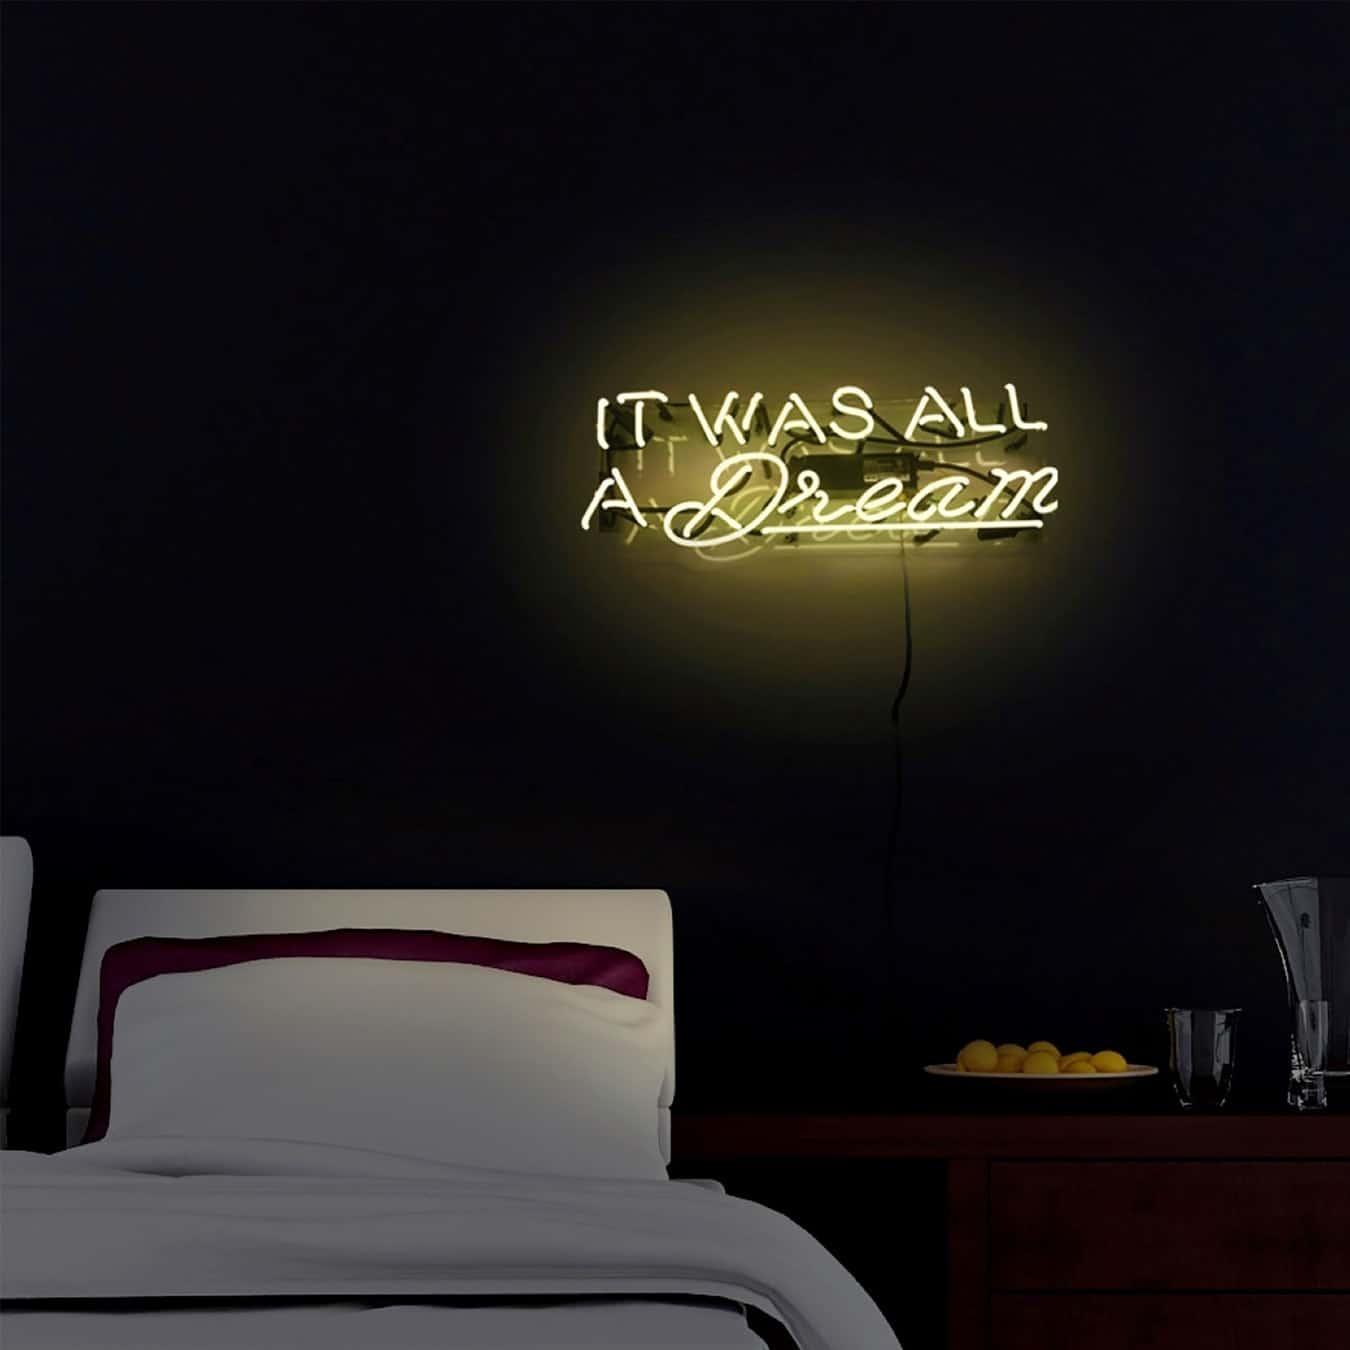 neon yellow sign